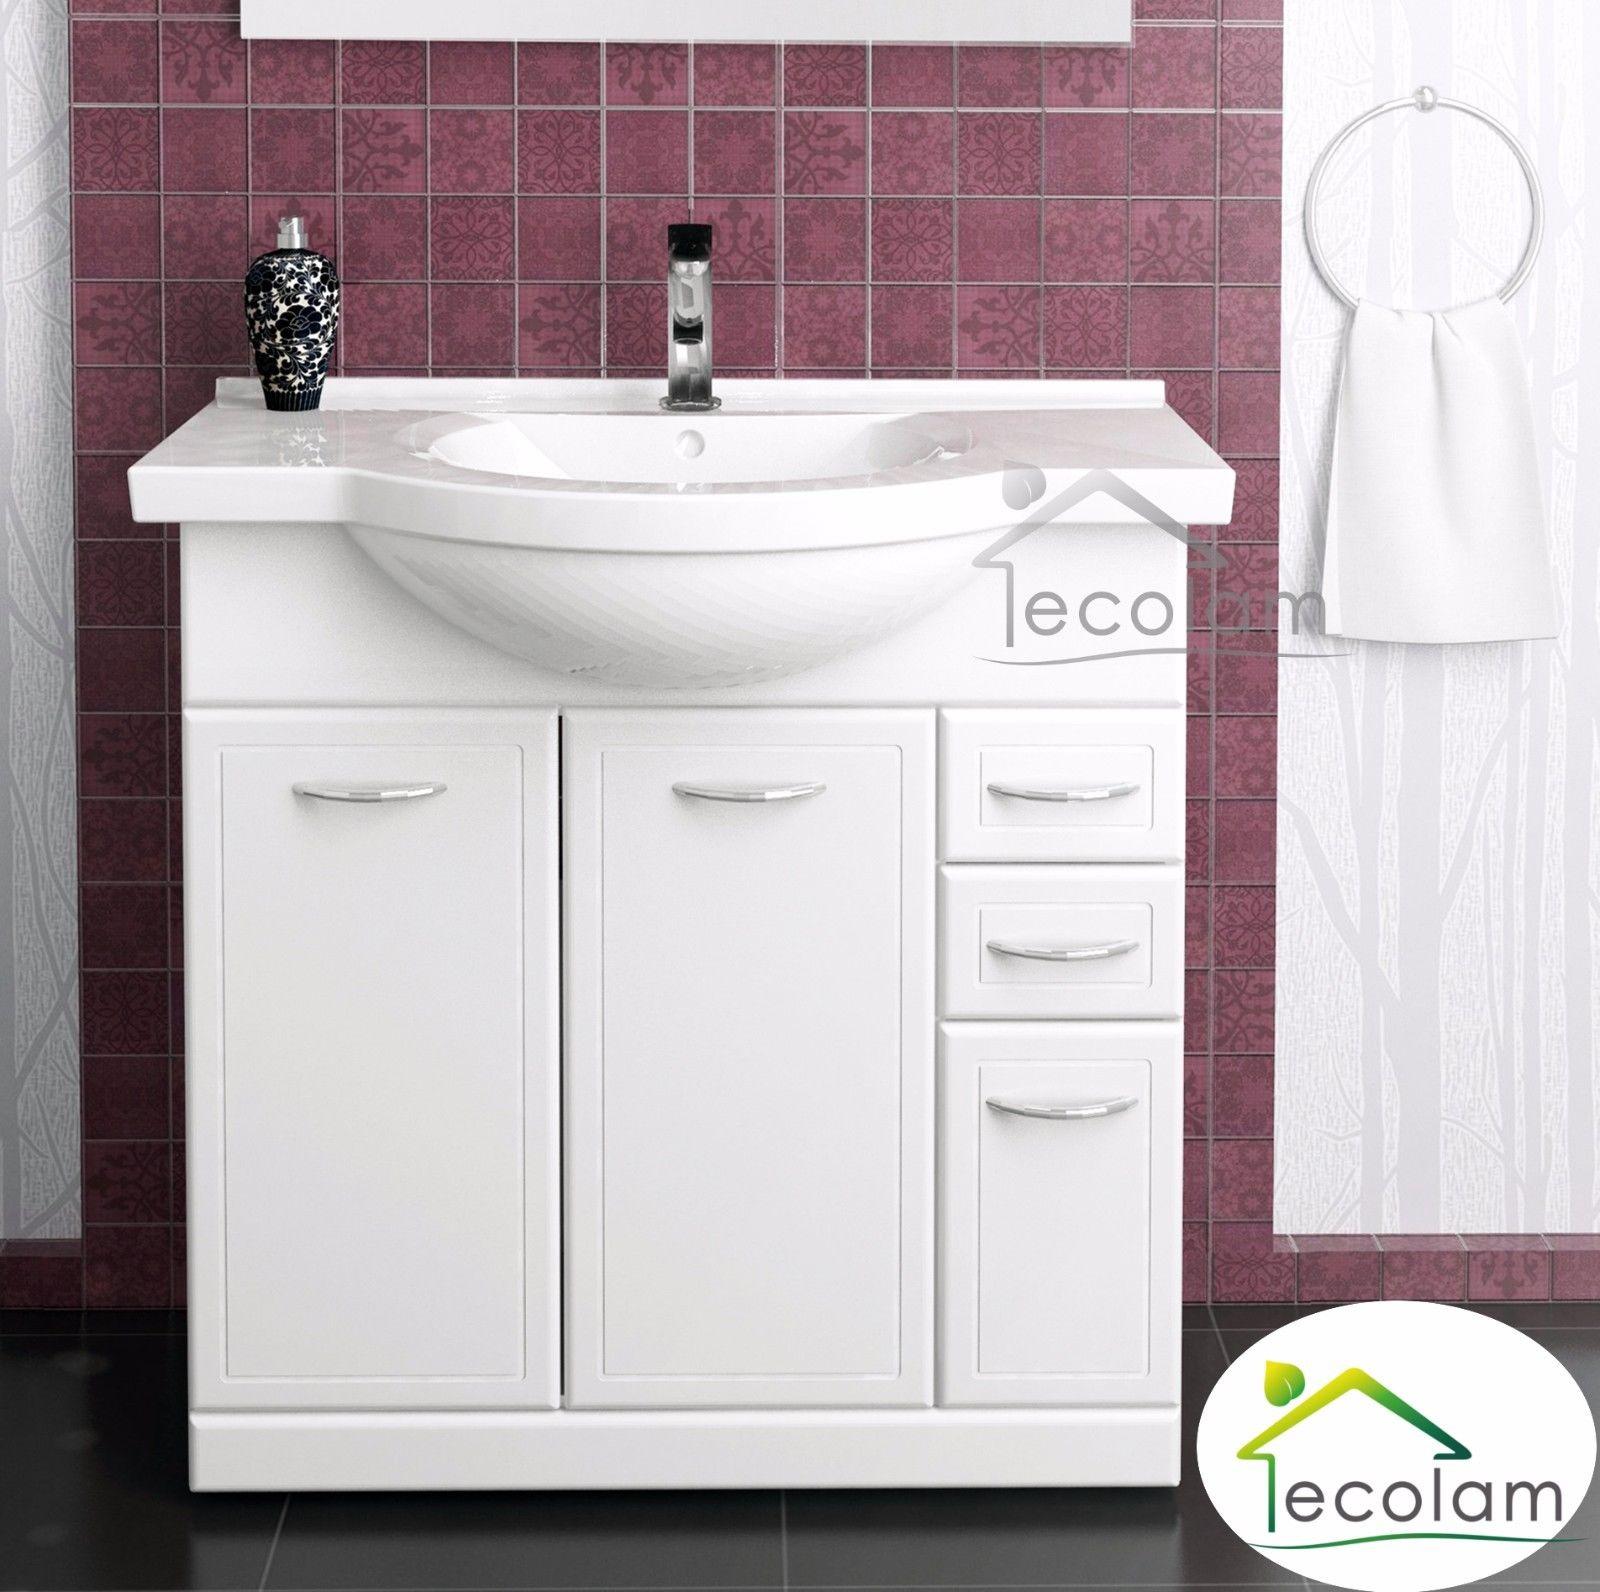 badewanne wanne eckwanne acryl 150 160 170 x 100 cm sch rze styropor rechts ebay. Black Bedroom Furniture Sets. Home Design Ideas